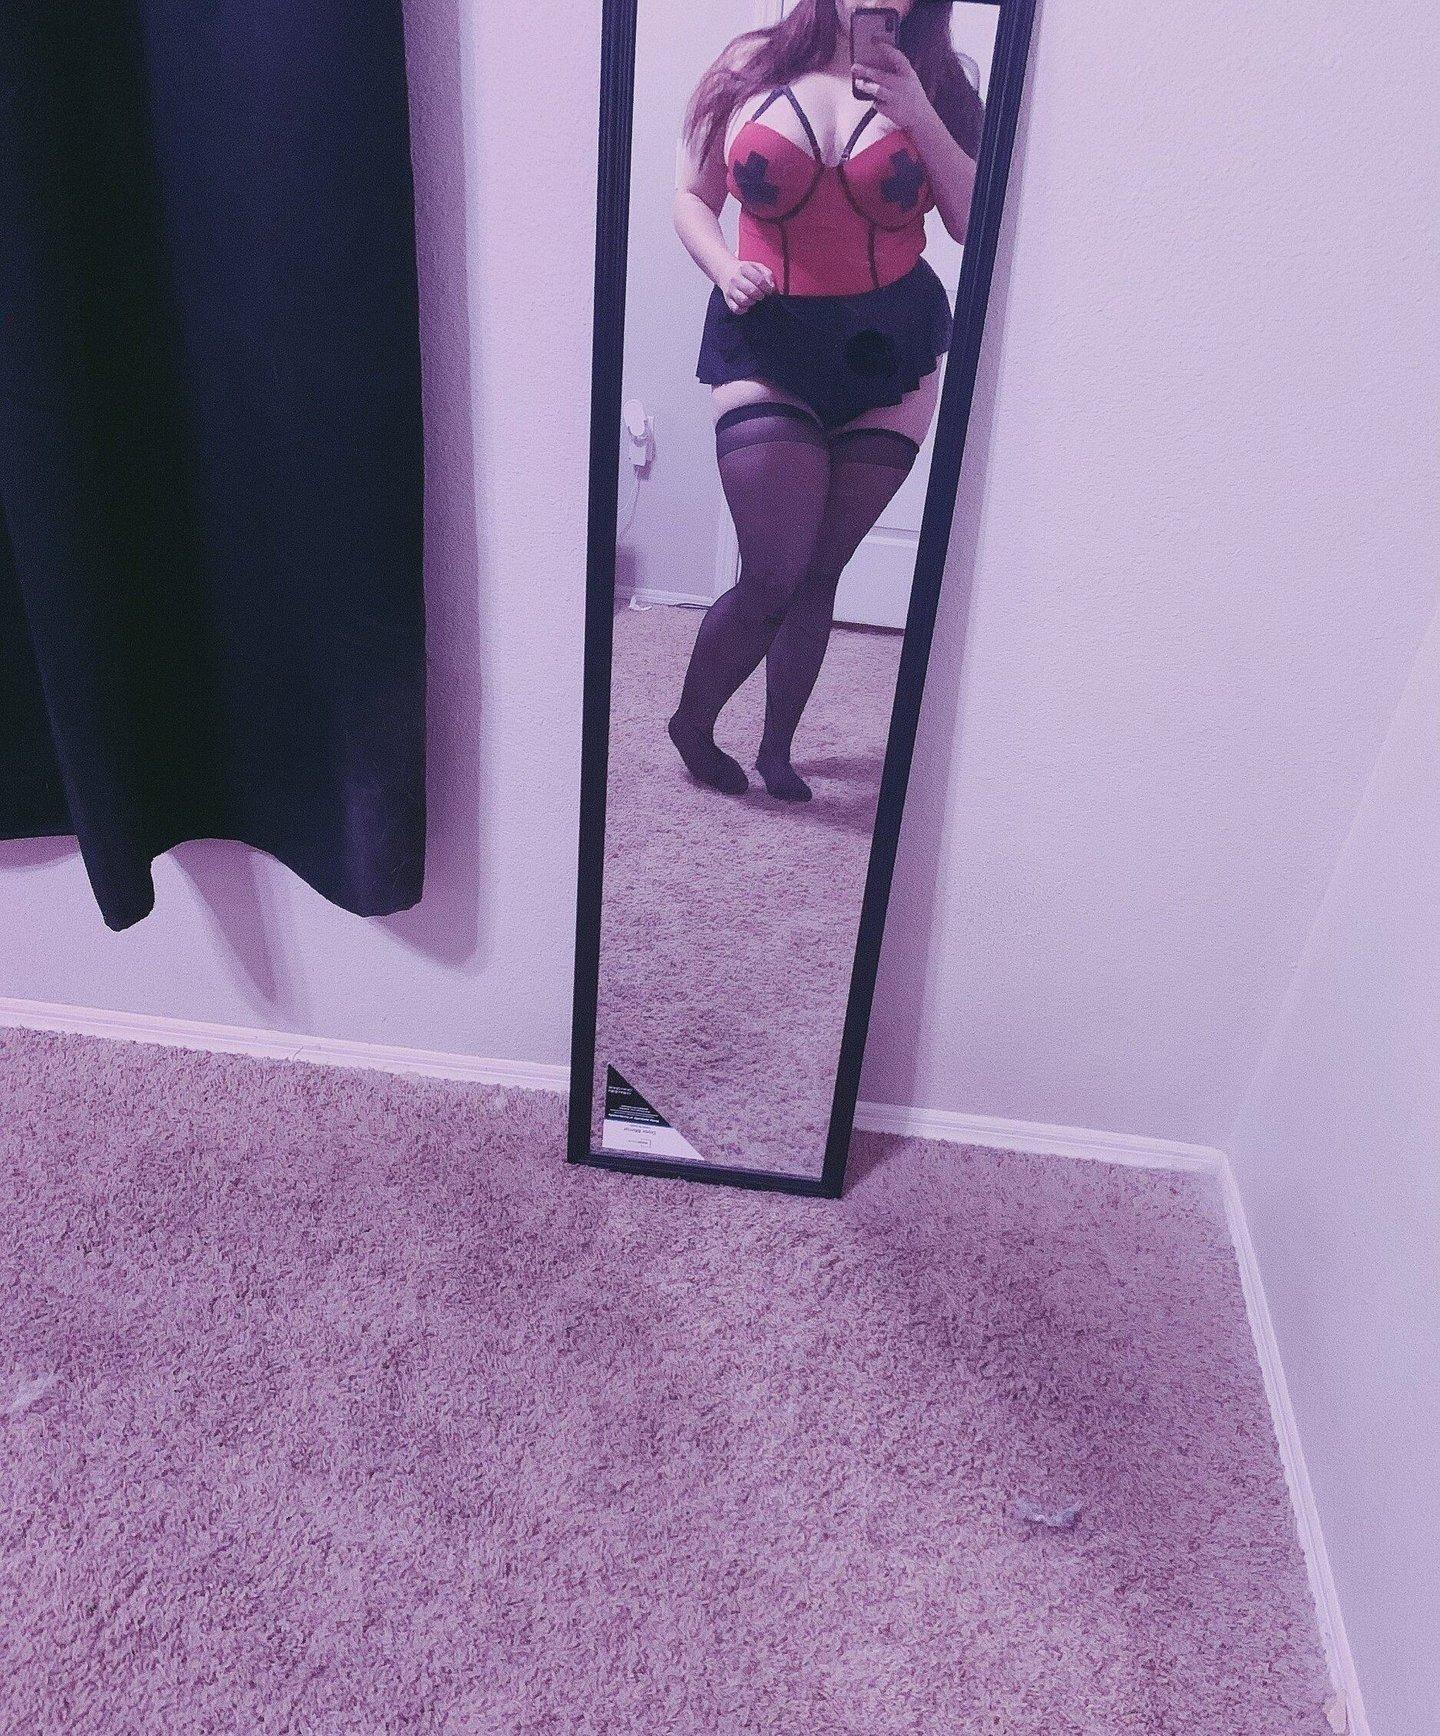 Megan Jewel Jewelmegan Twitch Sexy Leaks 0005